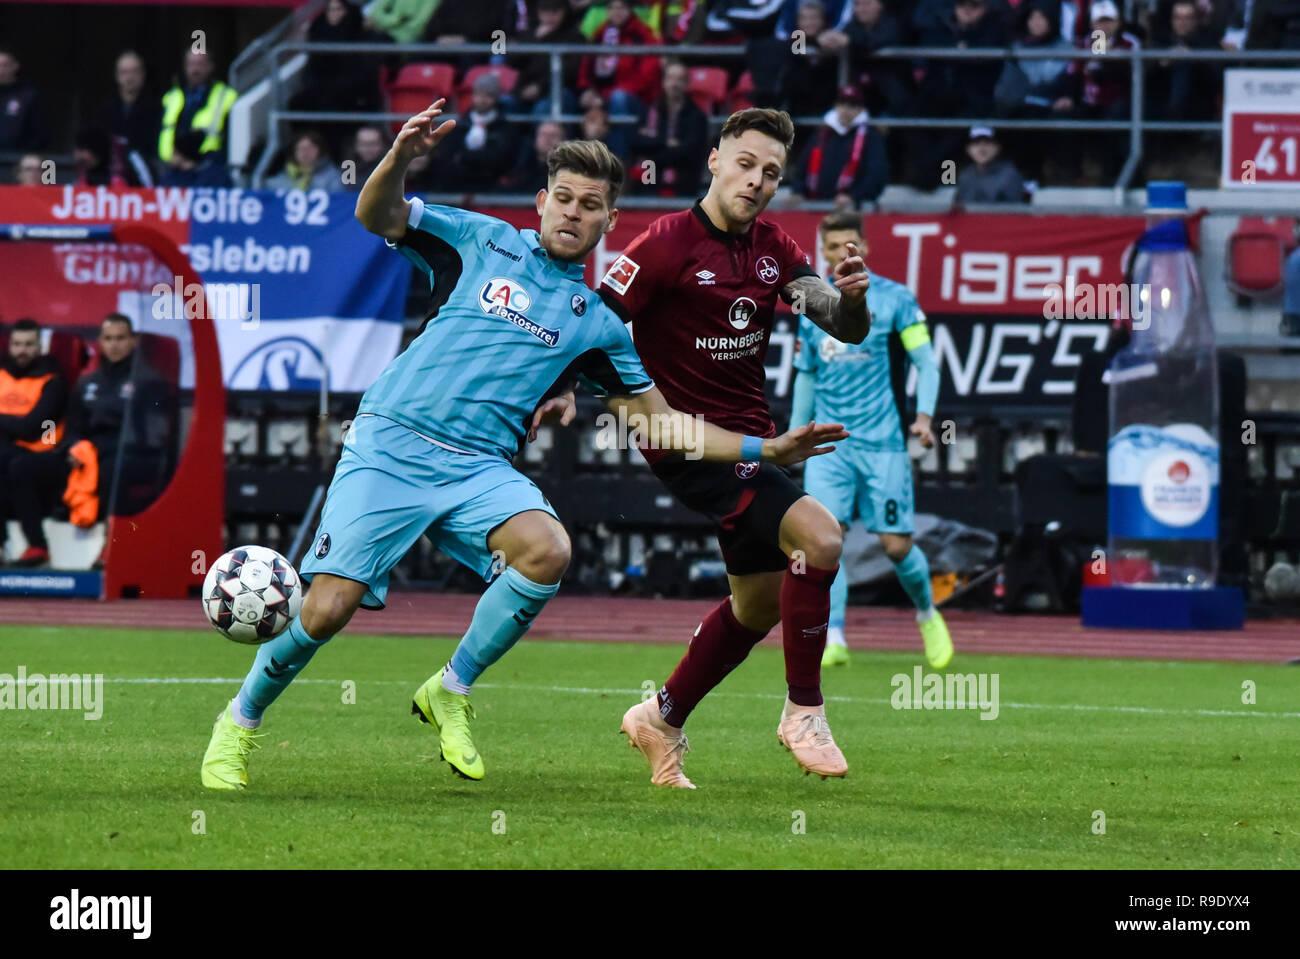 Germany, NŸrnberg, Max Morlock Stadion - 22 Dec 2018 - Soccer, 1.Bundesliga - 1.FC NŸrnberg vs. SC Freiburg -  Image: (Florian Niederlechner (SC Freiburg, #7), Georg Margreitter (1. FC NŸrnberg, #33).  Foto: HMB Media / Ryan Evans Credit: Ryan Evans/Alamy Live News - Stock Image